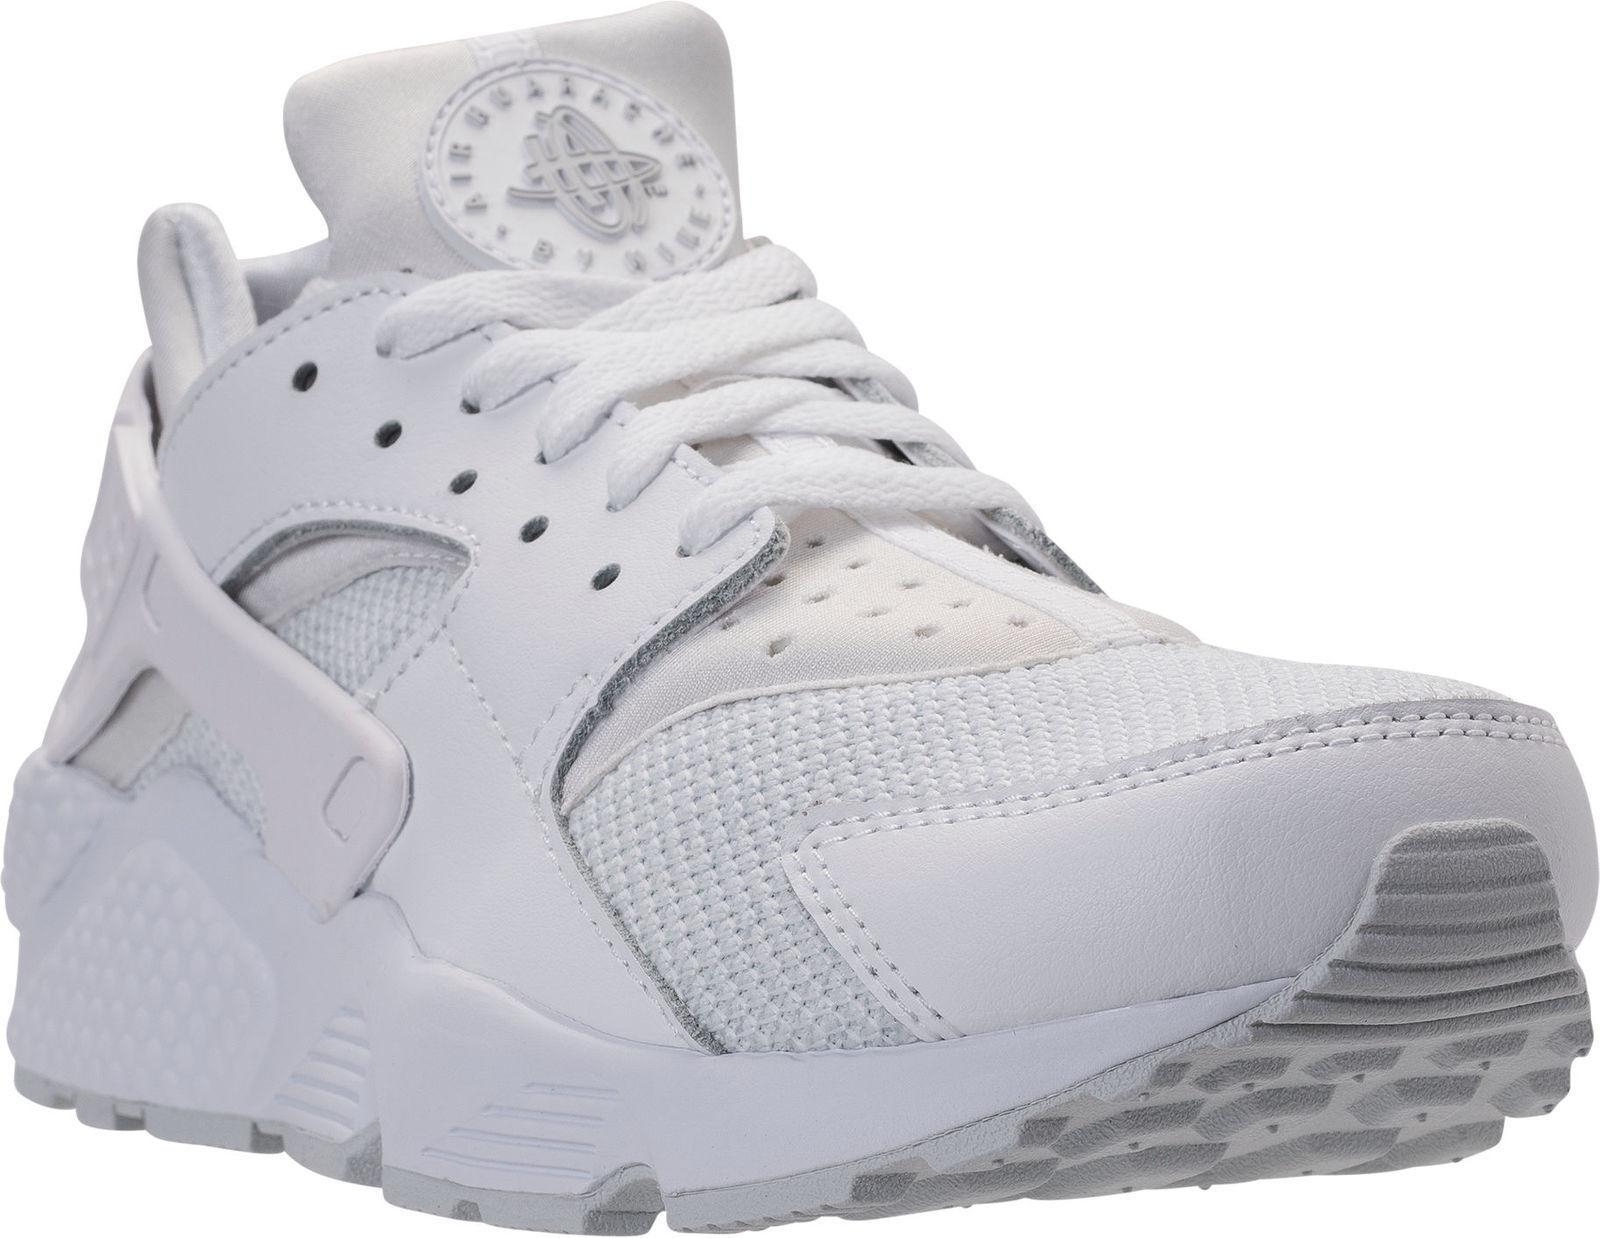 Nike Air Huarache Run Running Shoes White Camo  SZ 10  [318429 109]